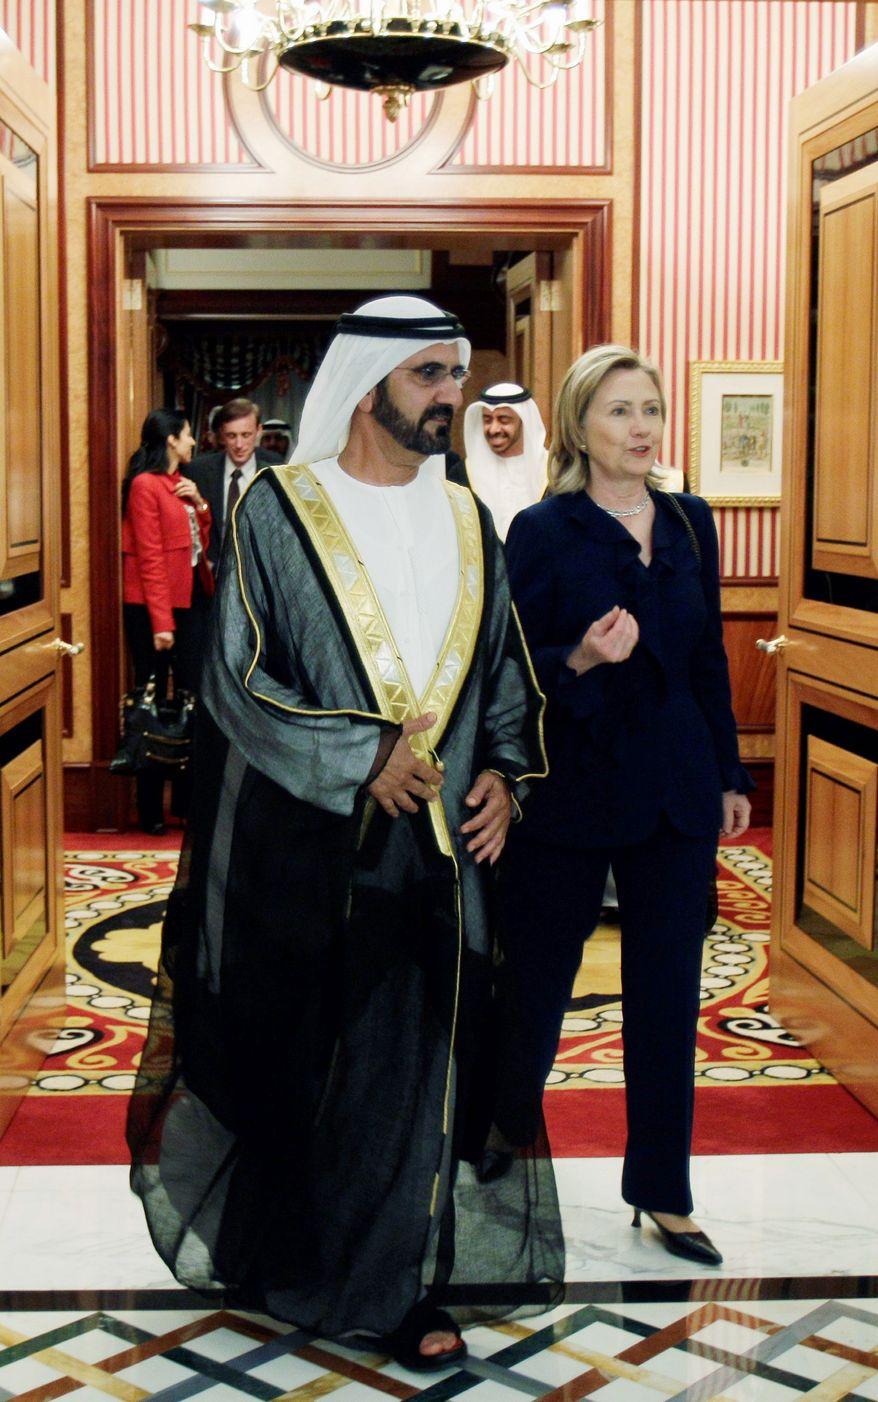 Secretary of State Hillary Rodham Clinton leaves Zabeel Palace after her meeting with United Arab Emirates Prime Minister Sheik Mohammad bin Rashid Al Maktoum in Dubai on Monday. (Associated Press)